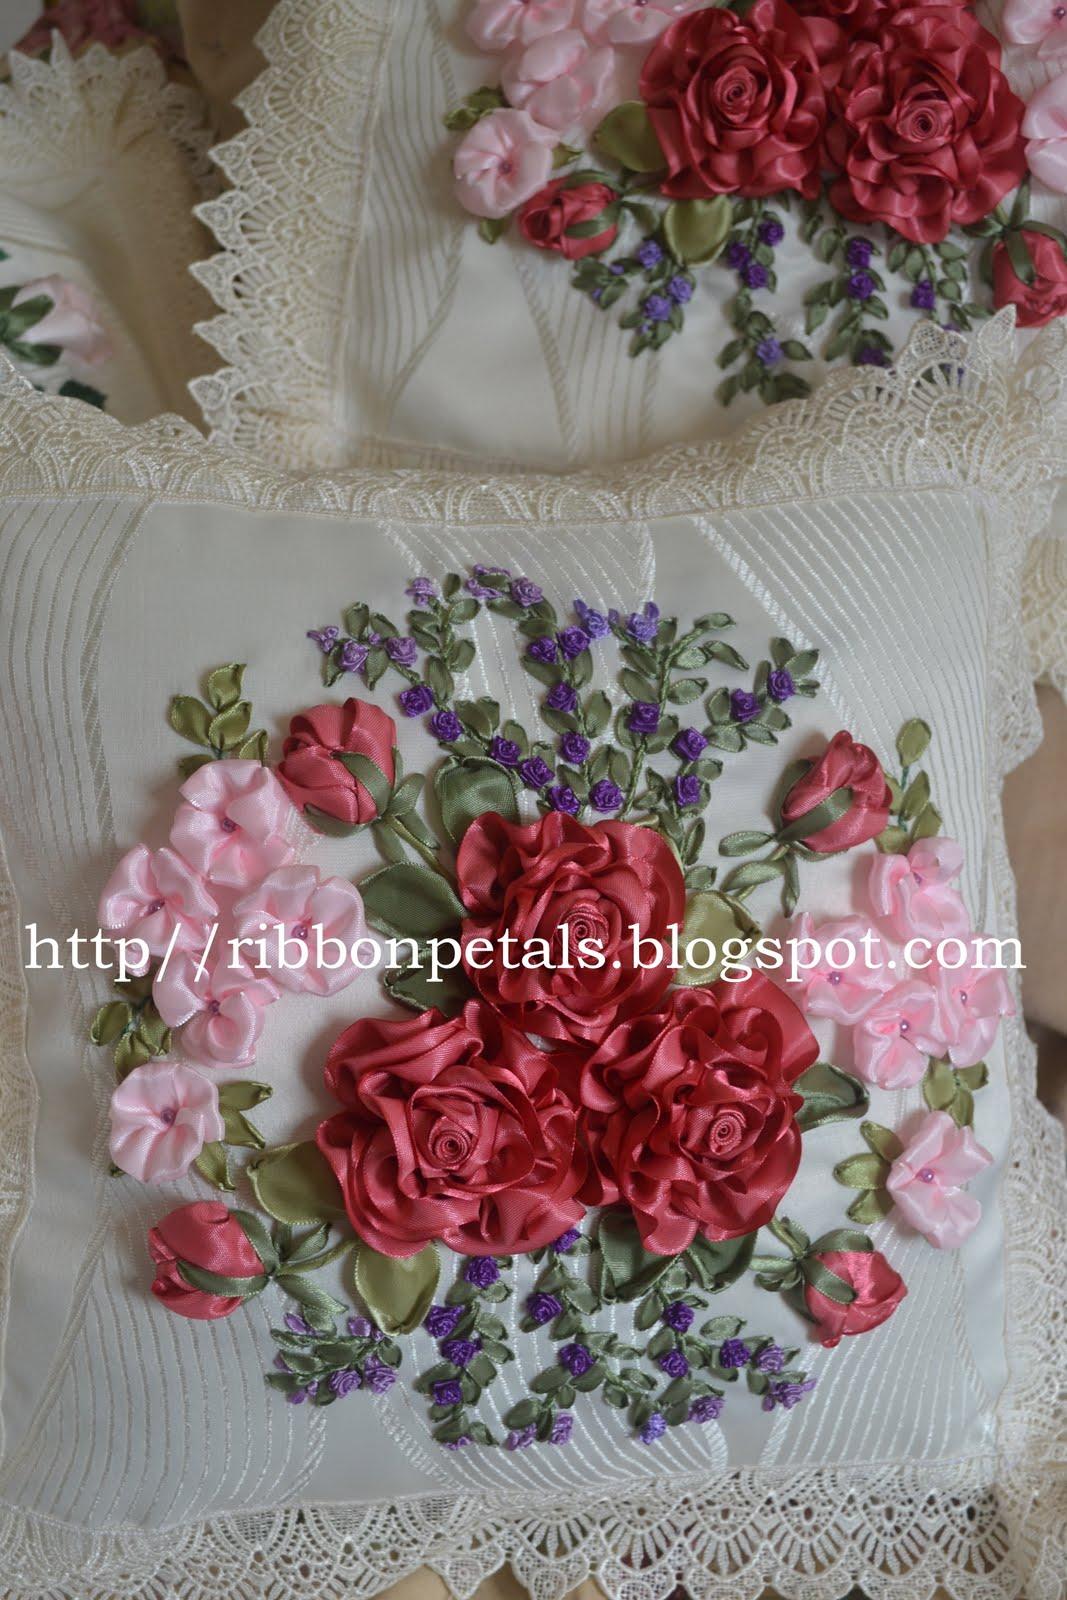 http://2.bp.blogspot.com/-AhnyVnwmaxU/TujAG1Aw_5I/AAAAAAAABmc/QgoOsGJ1vVg/s1600/DSC_0105.JPG